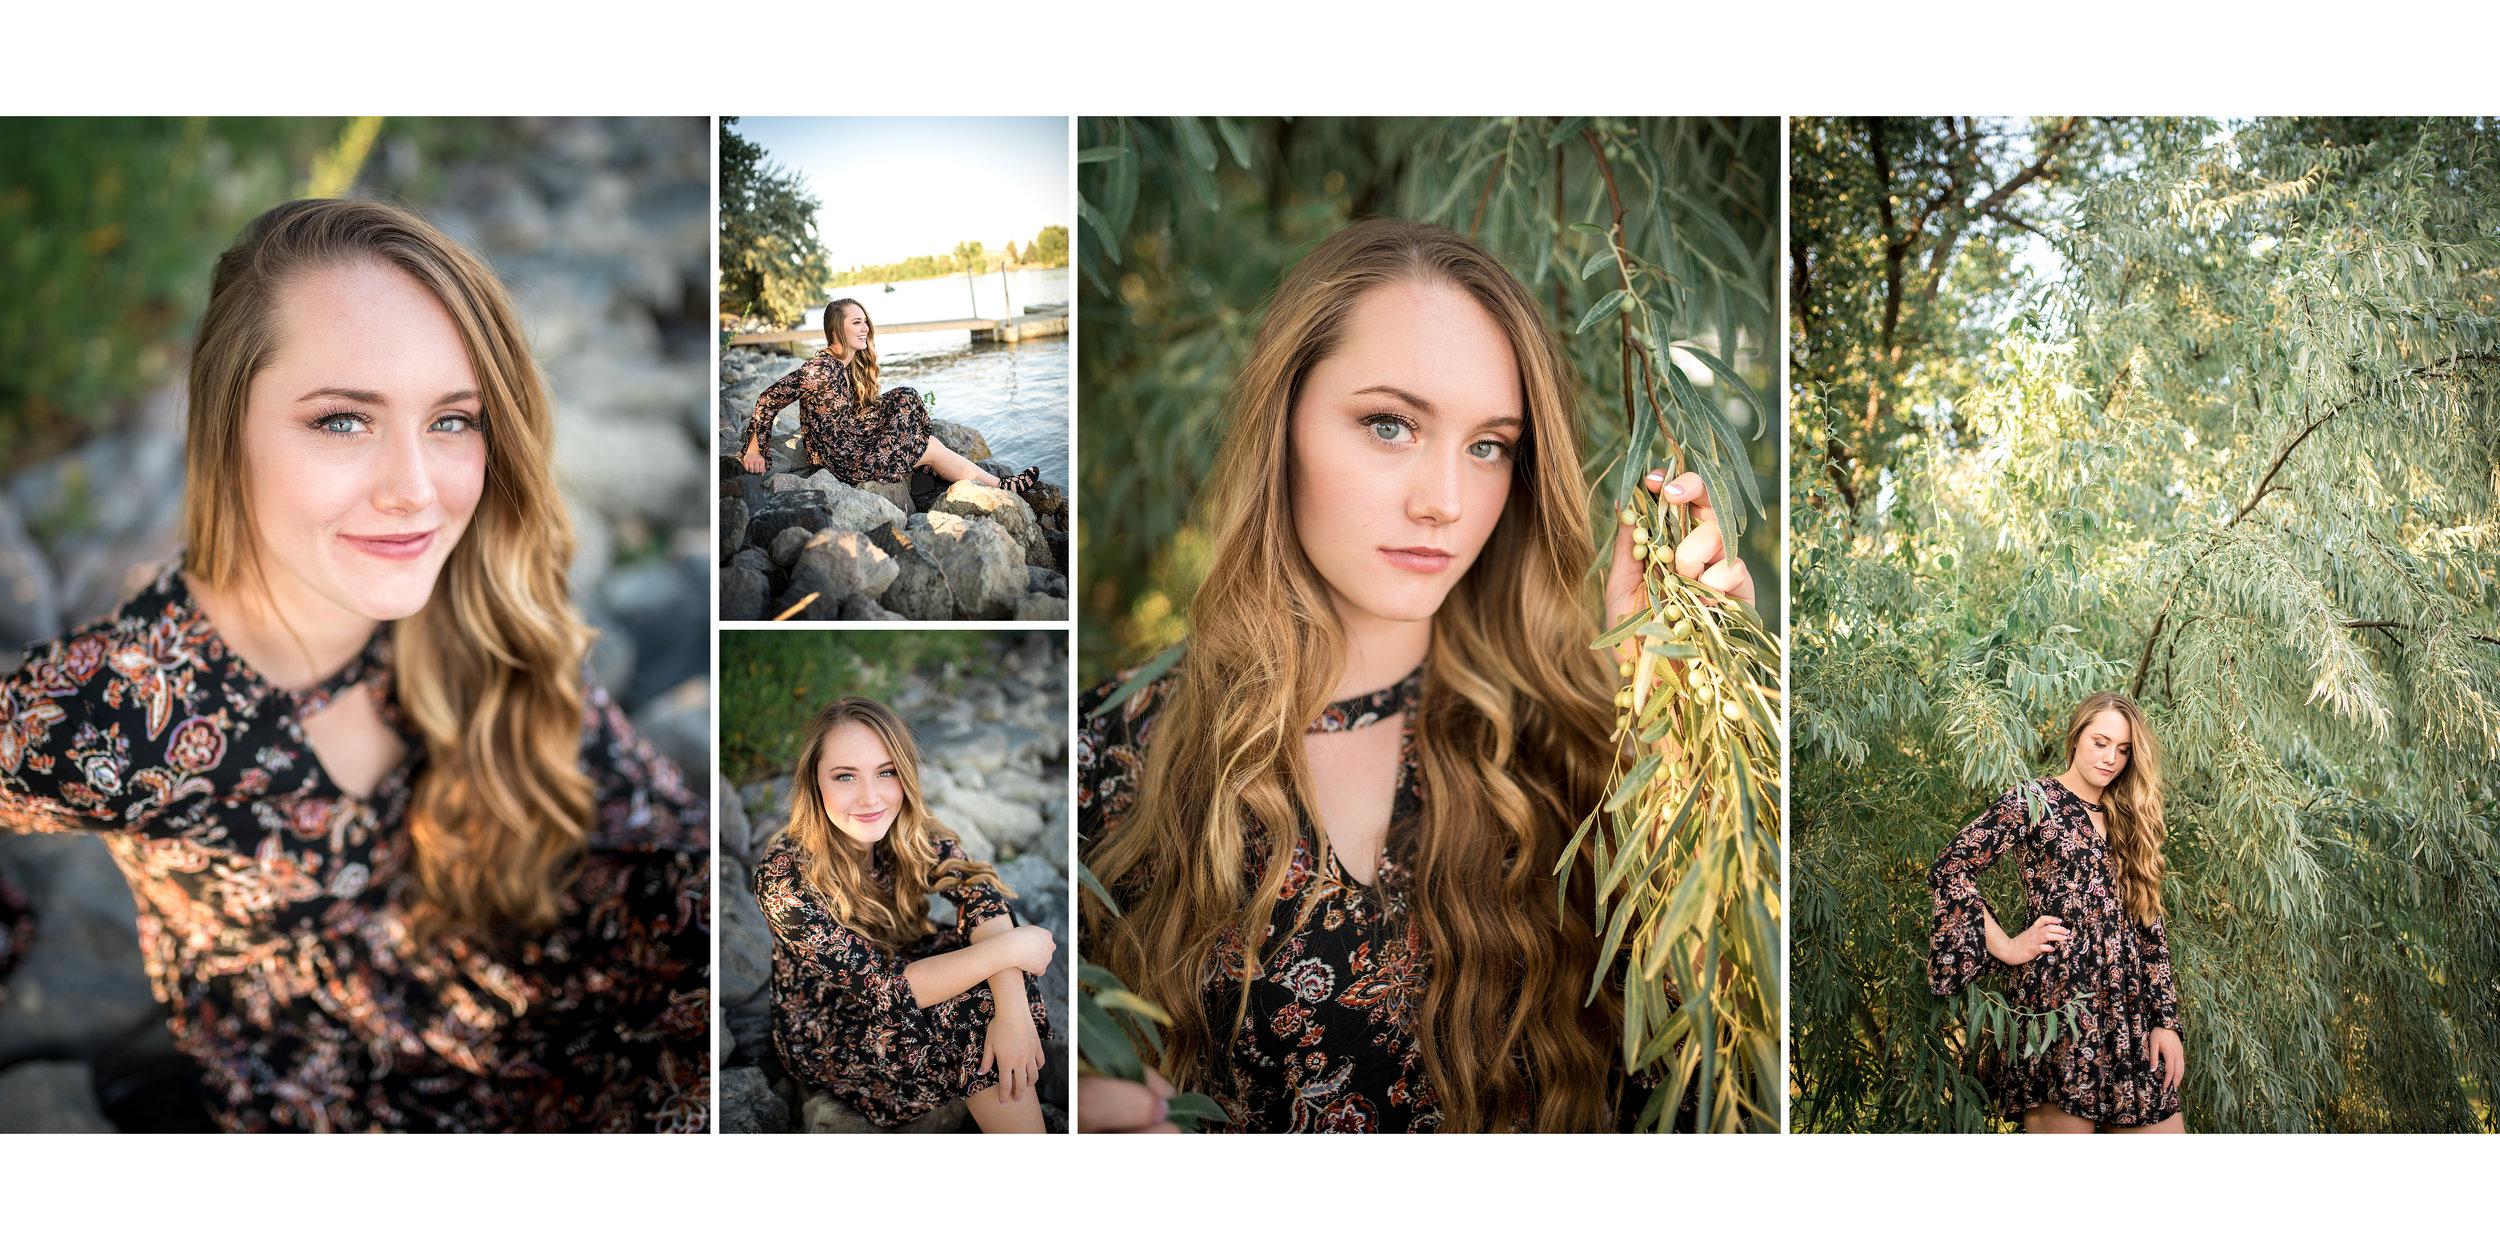 senior photographer in Great Falls, MT